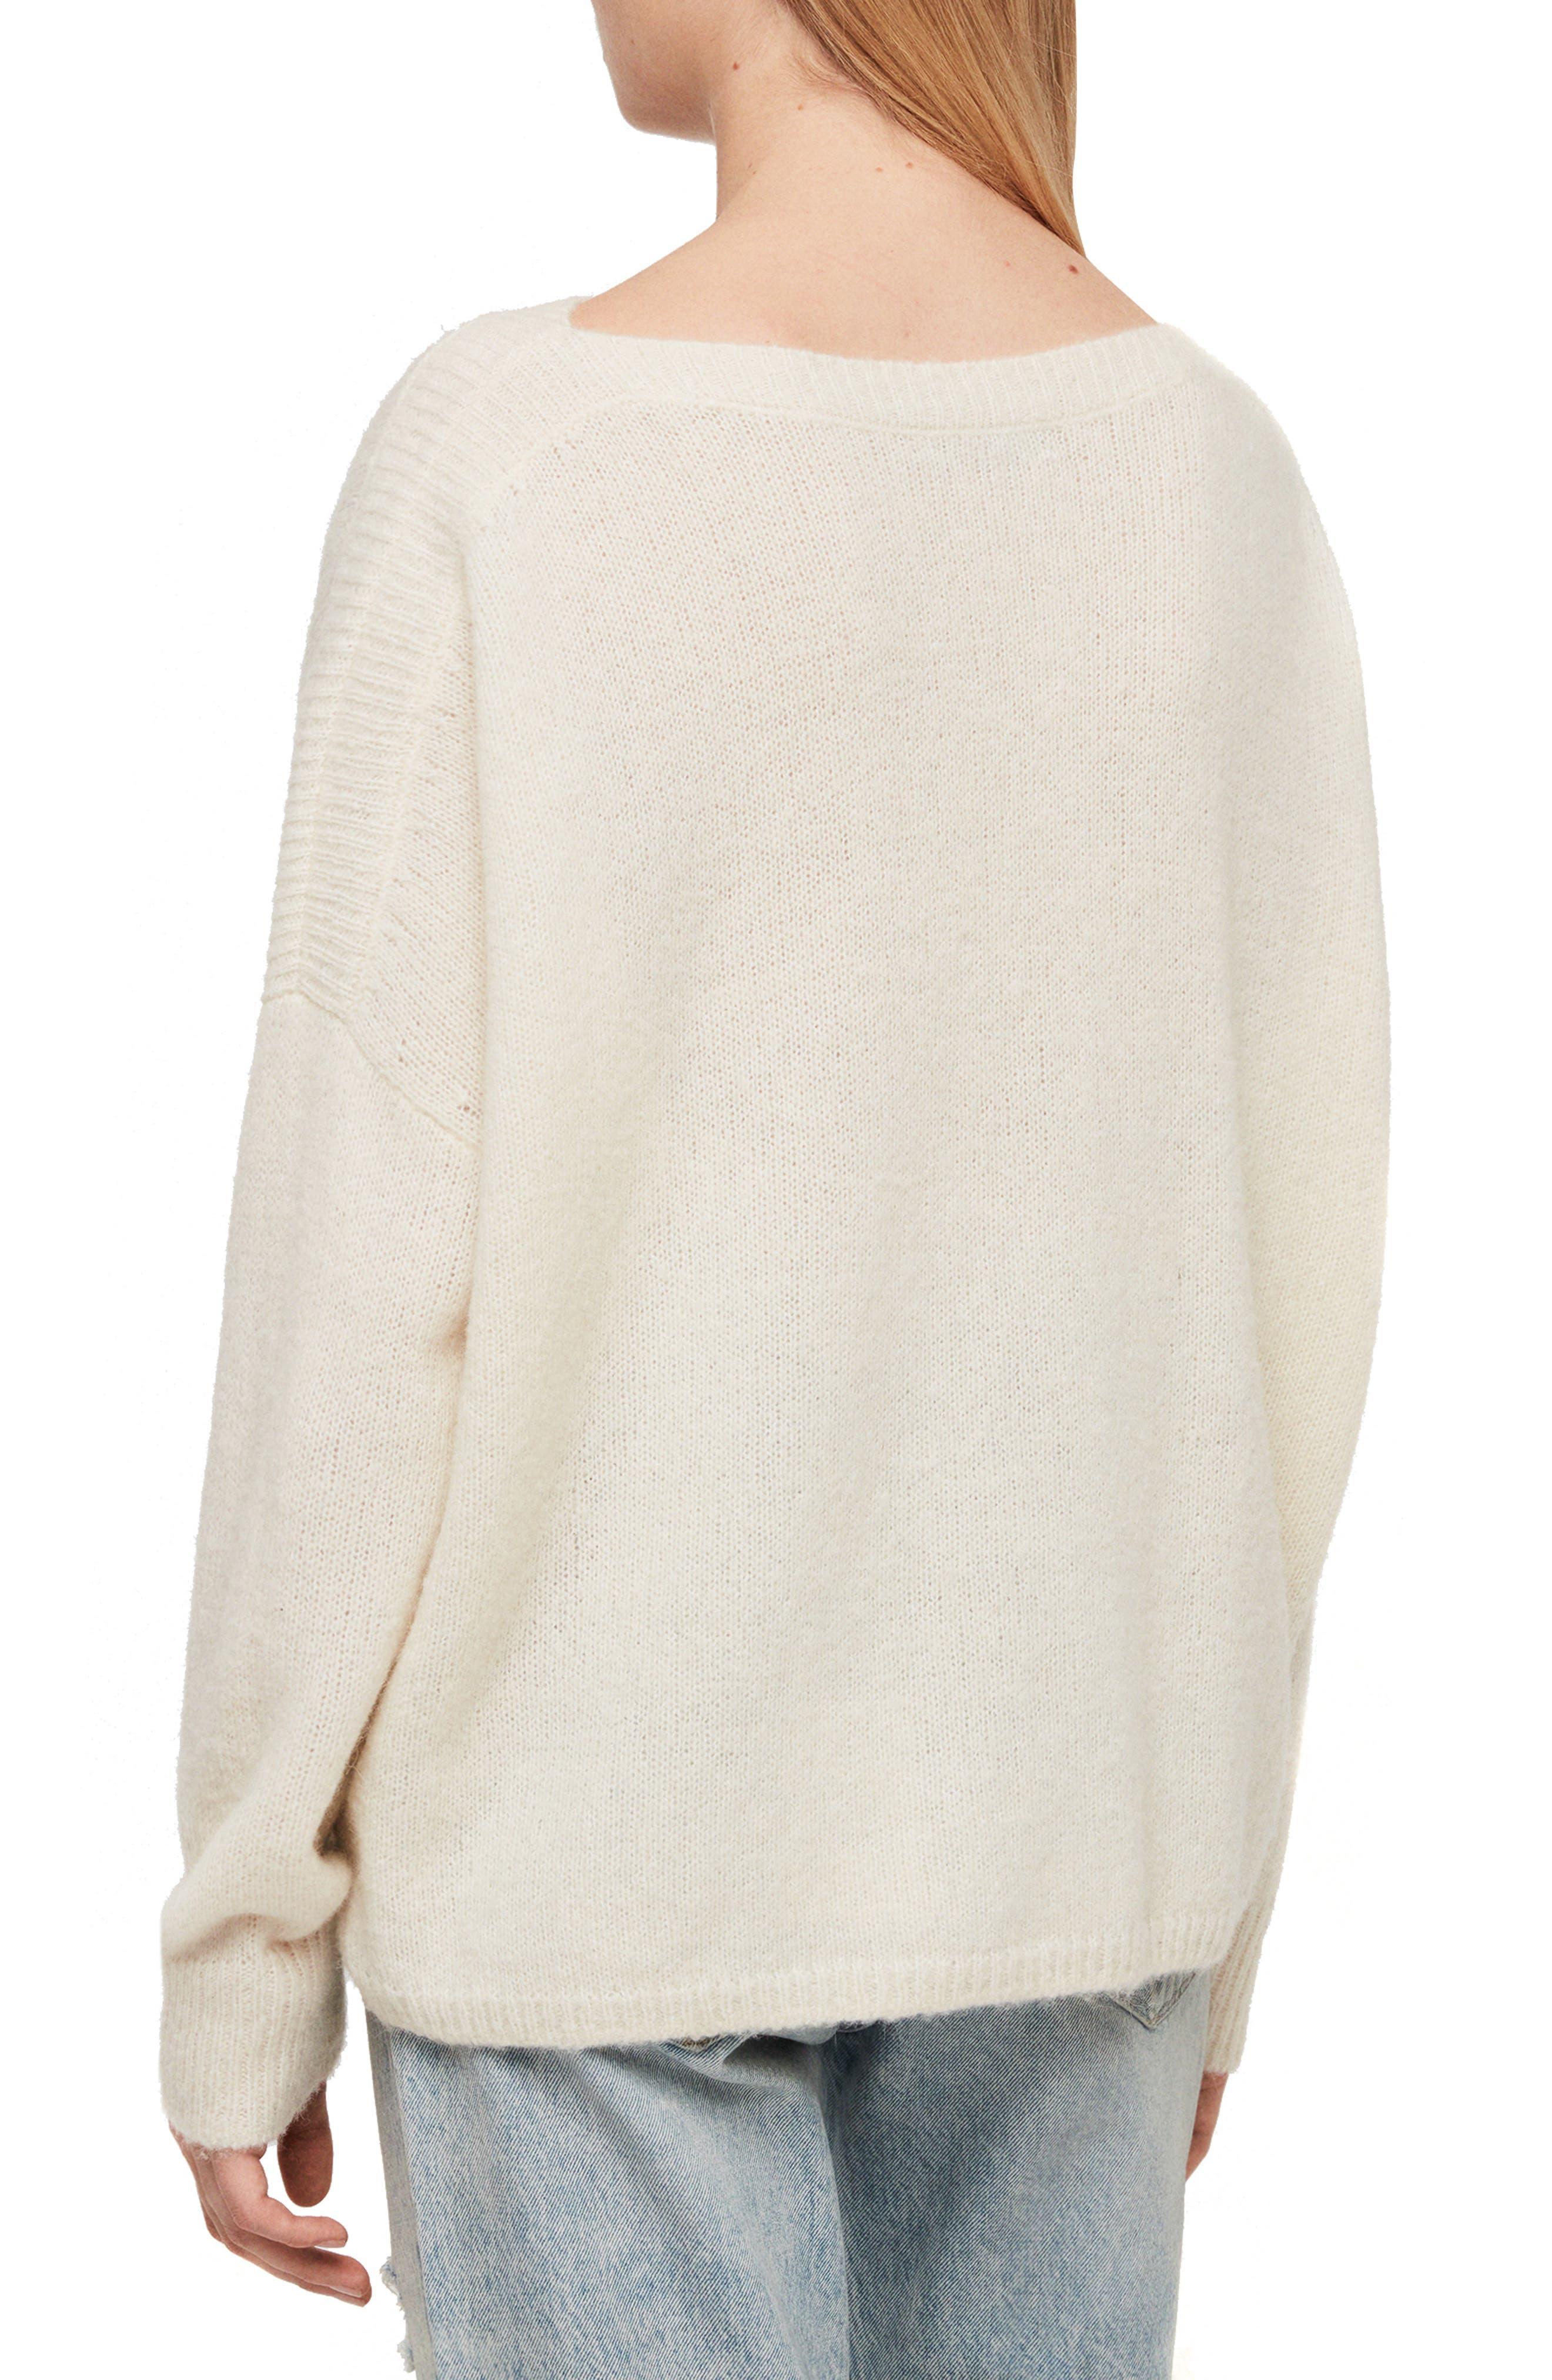 ALLSAINTS, Aris Sweater, Alternate thumbnail 2, color, CHALK WHITE